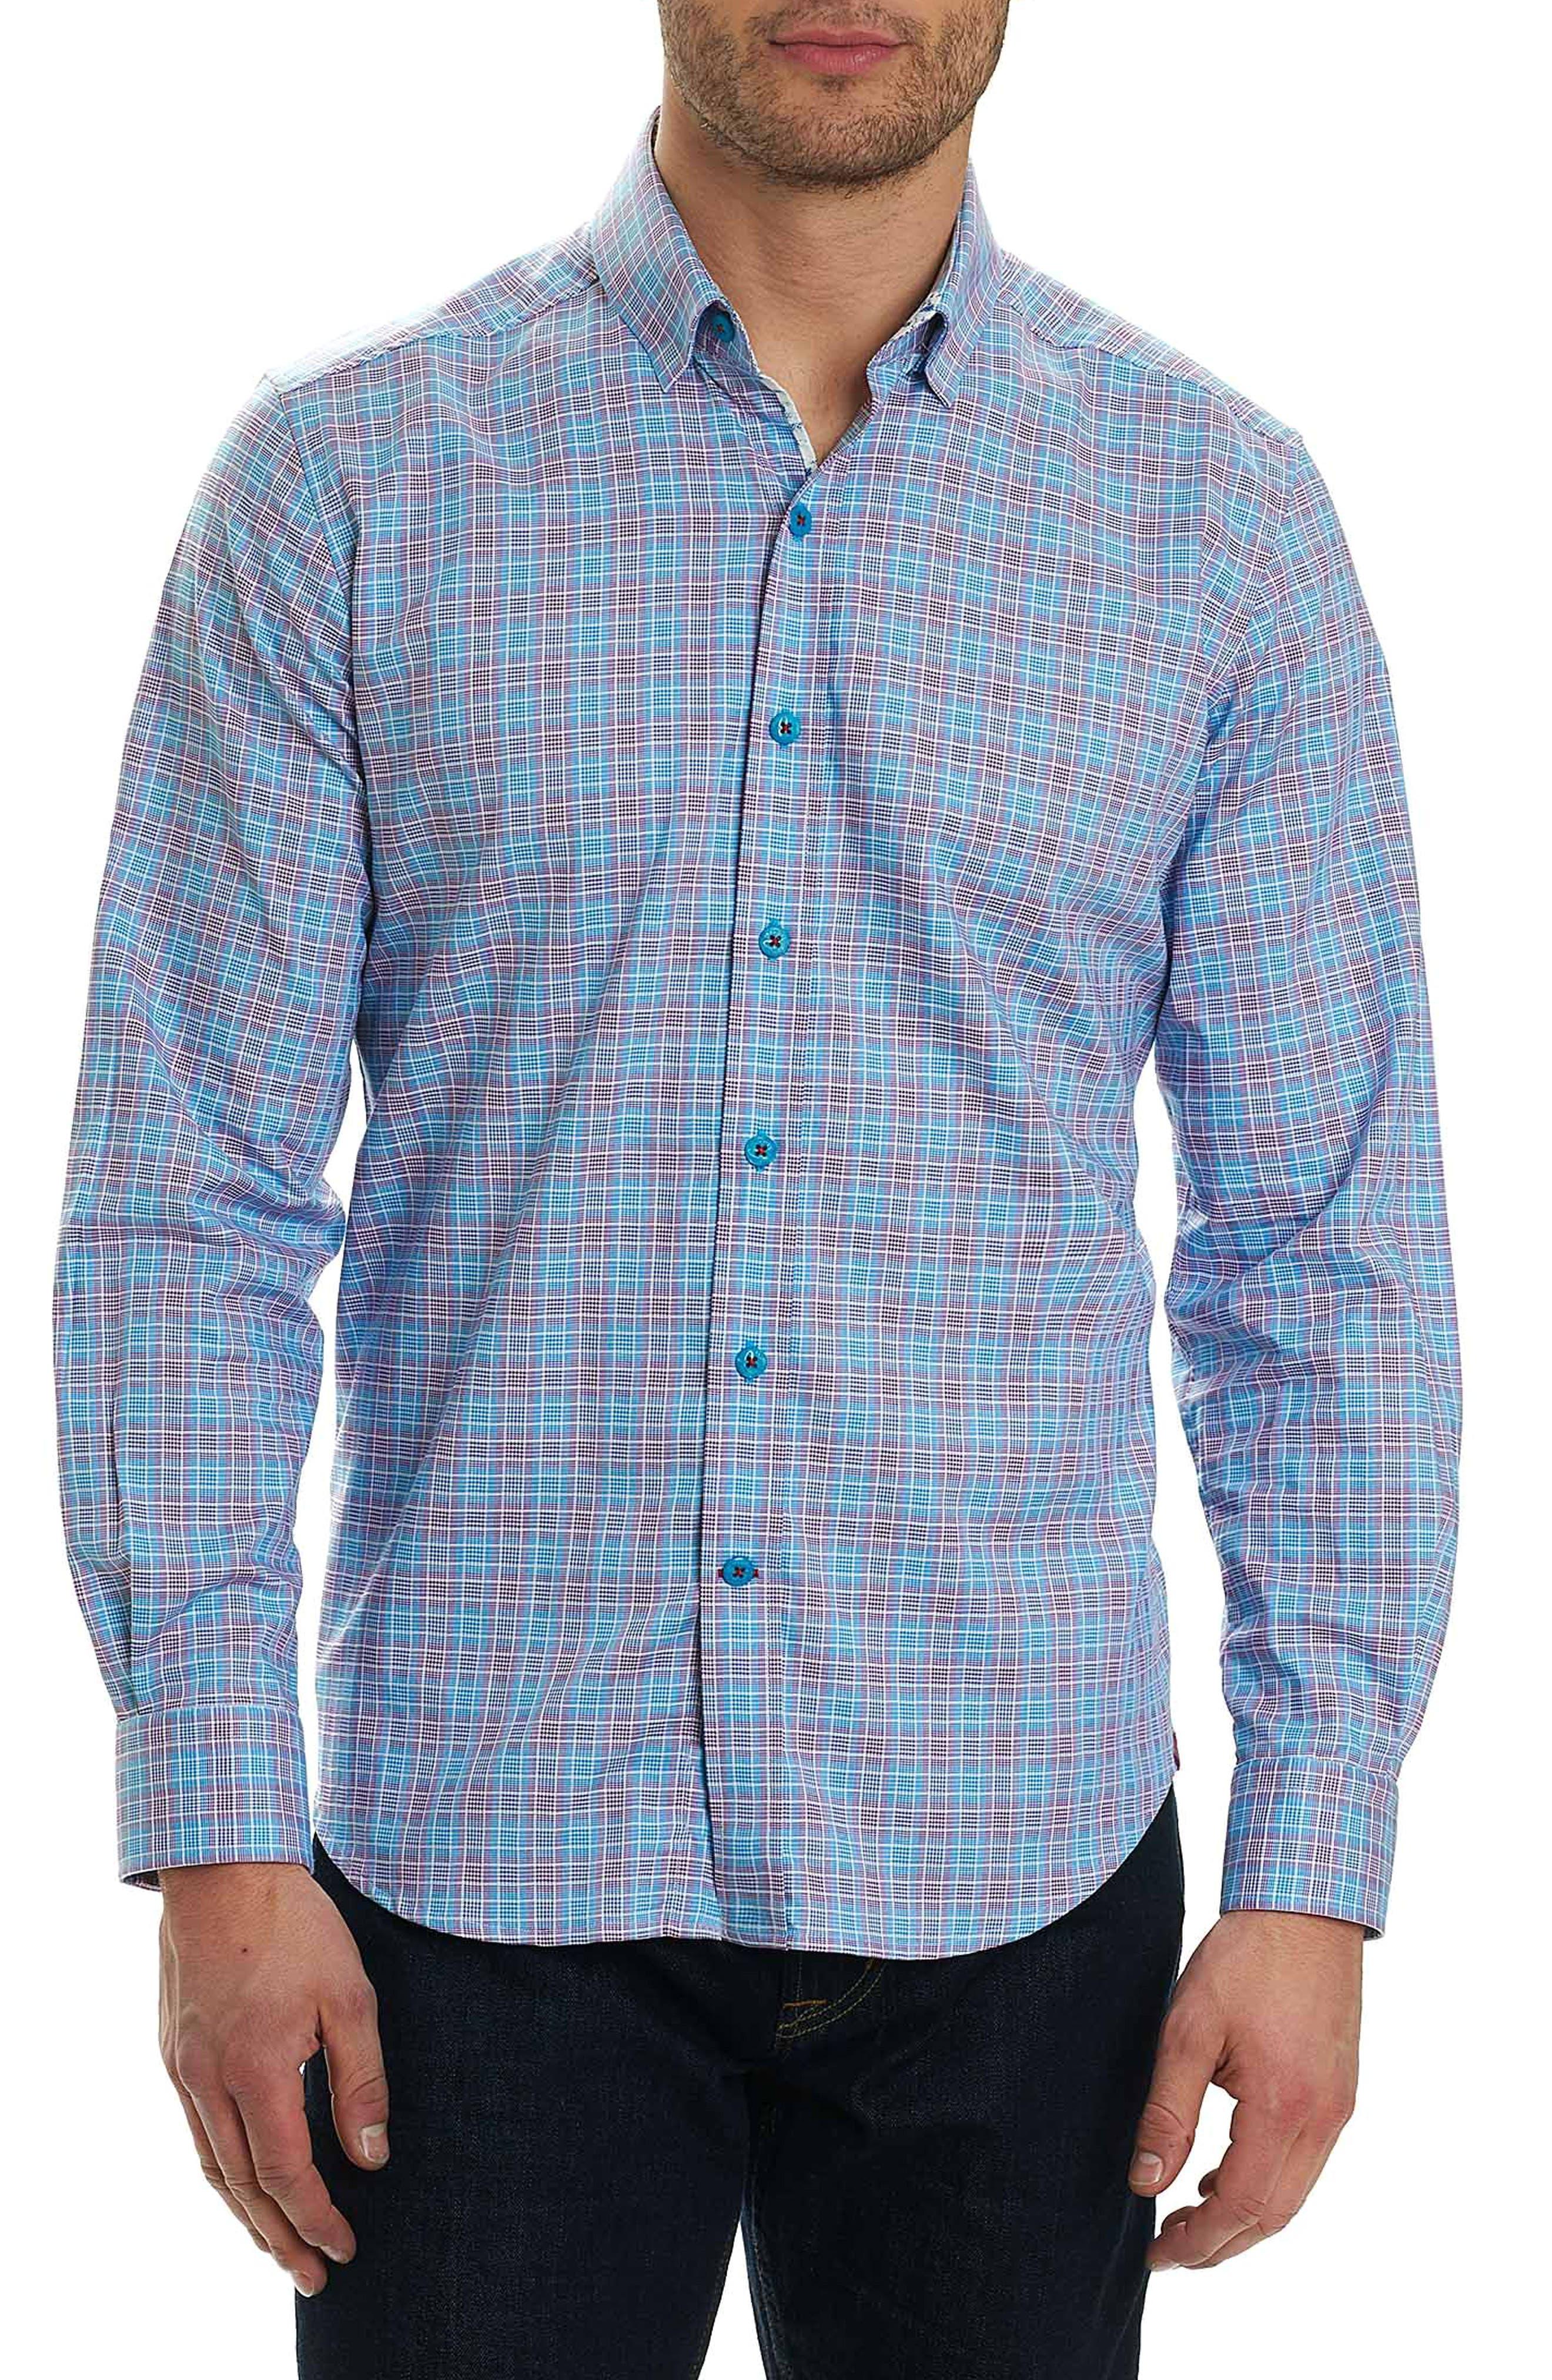 Ryan Regular Fit Sport Shirt,                             Main thumbnail 1, color,                             510